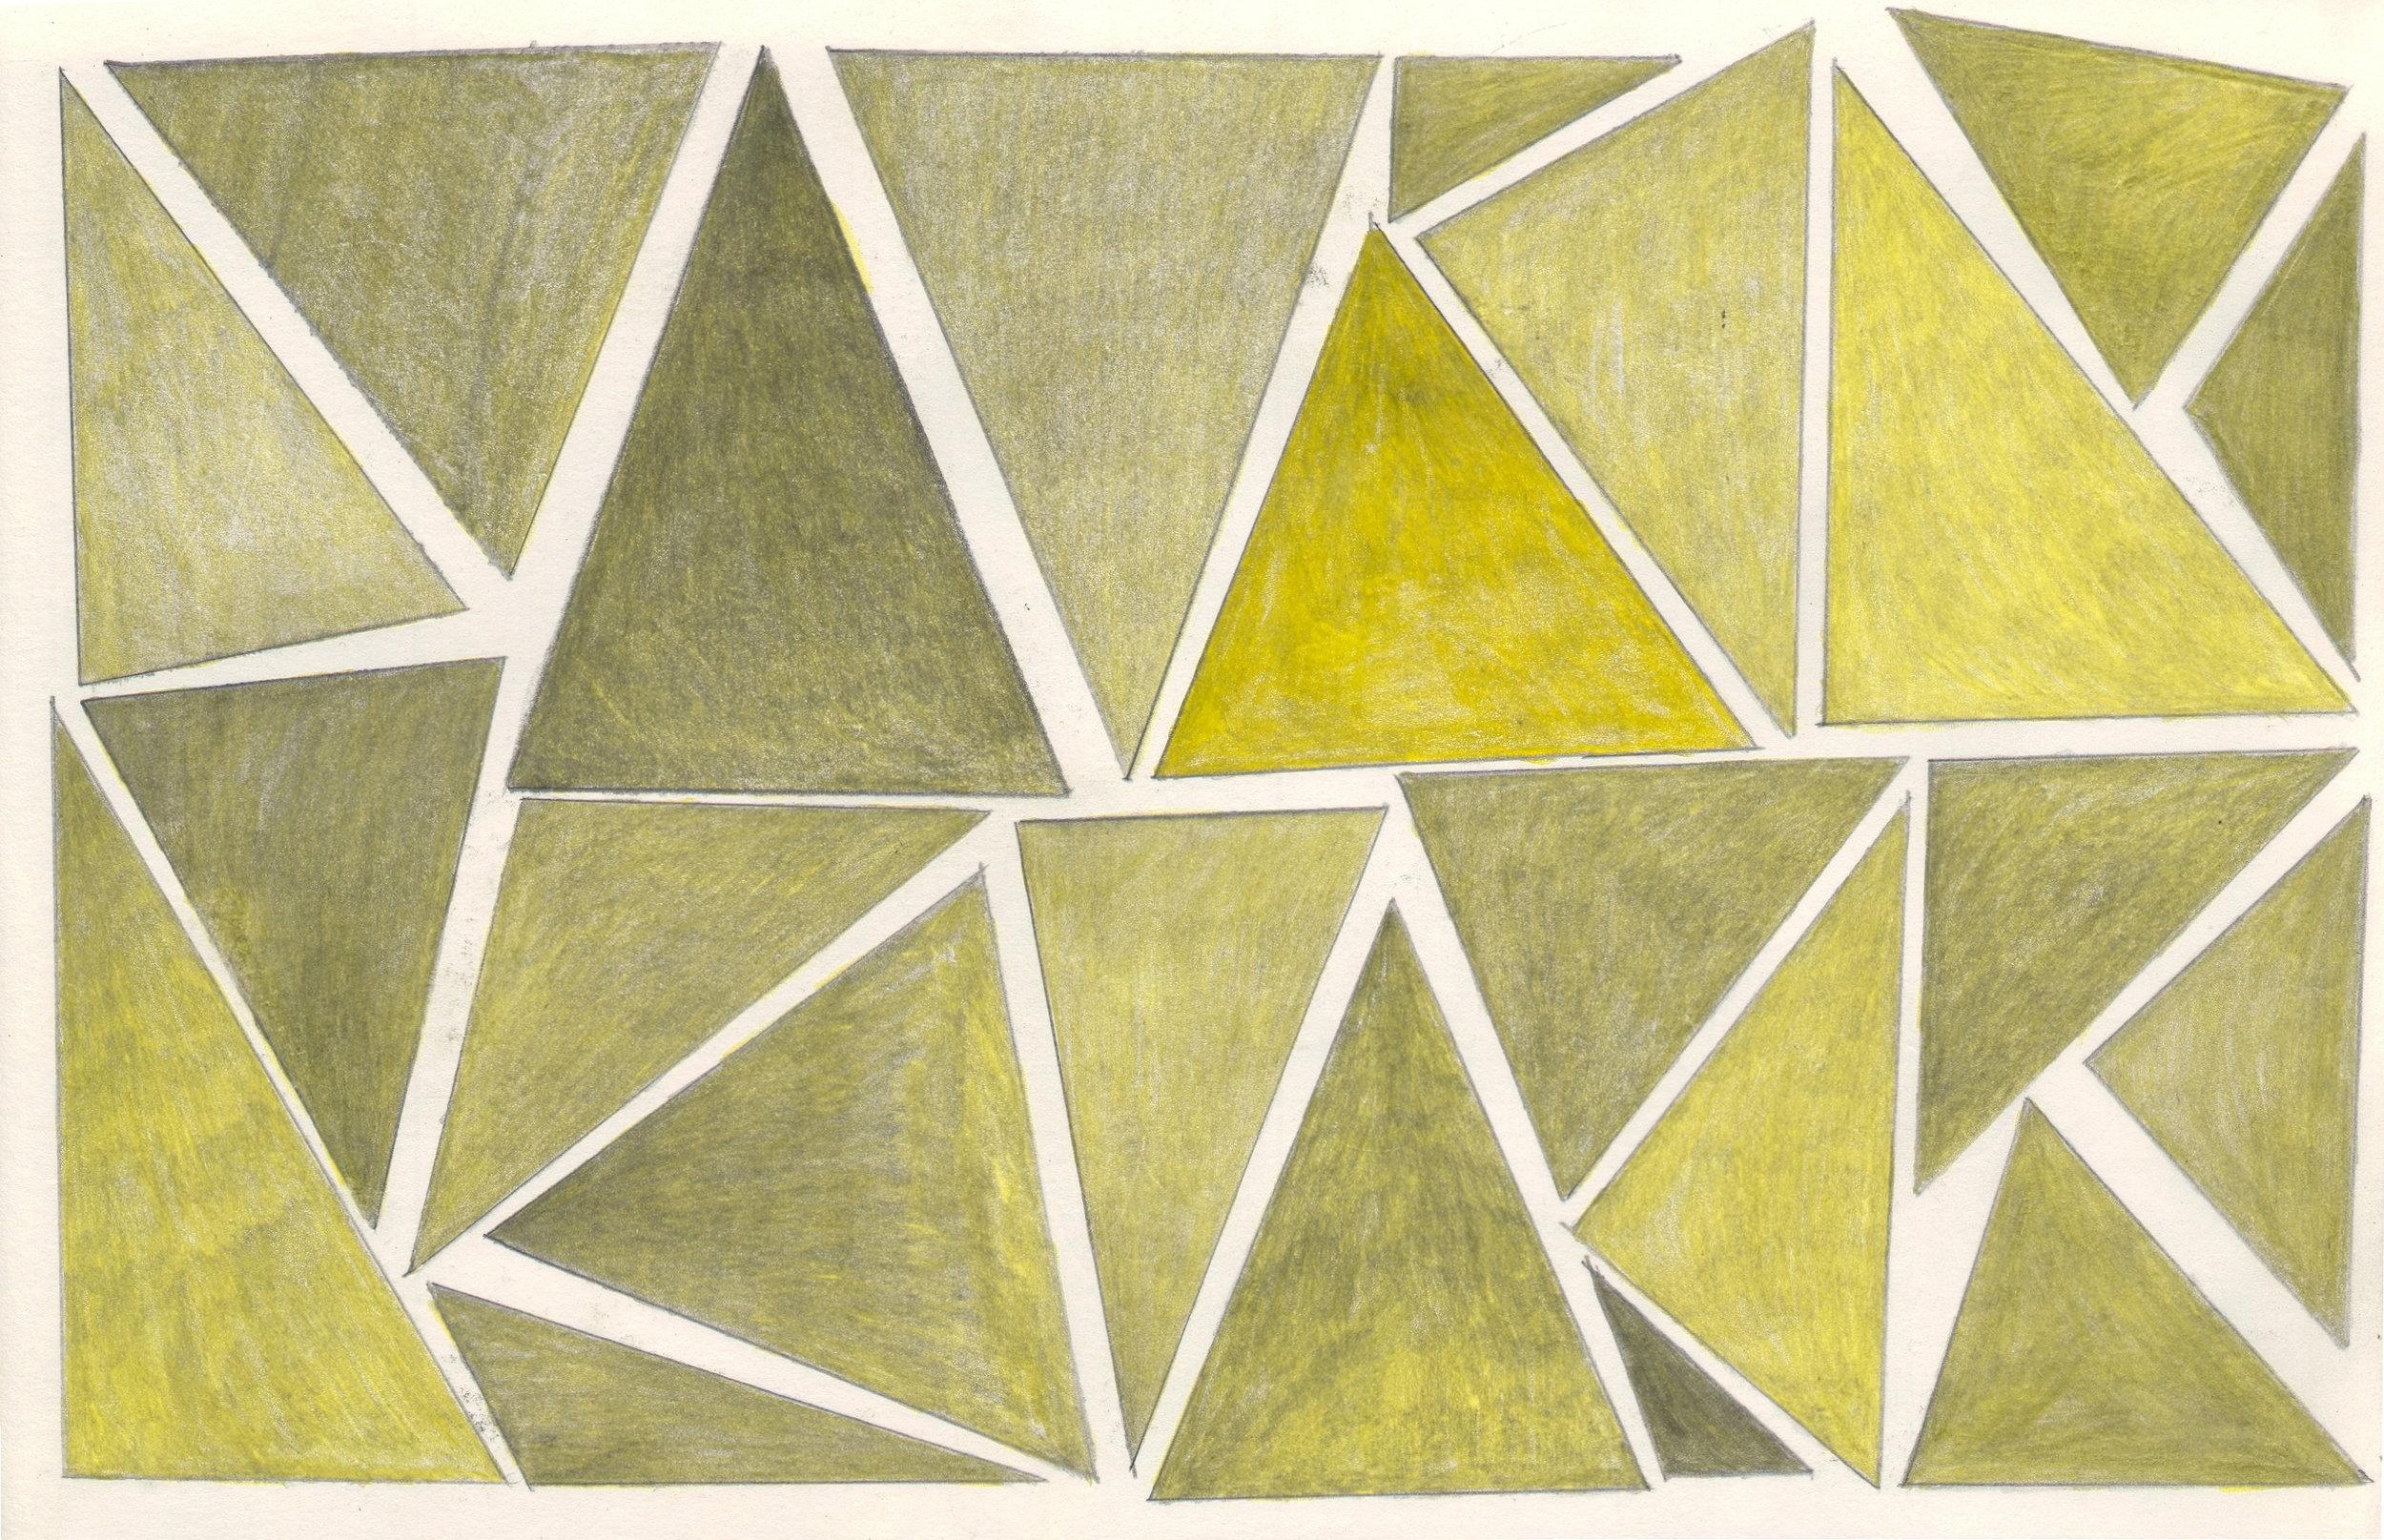 O.T. ( gelbe Dreiecke ), 2018  Bleistift auf Papier, 26x35.5cm